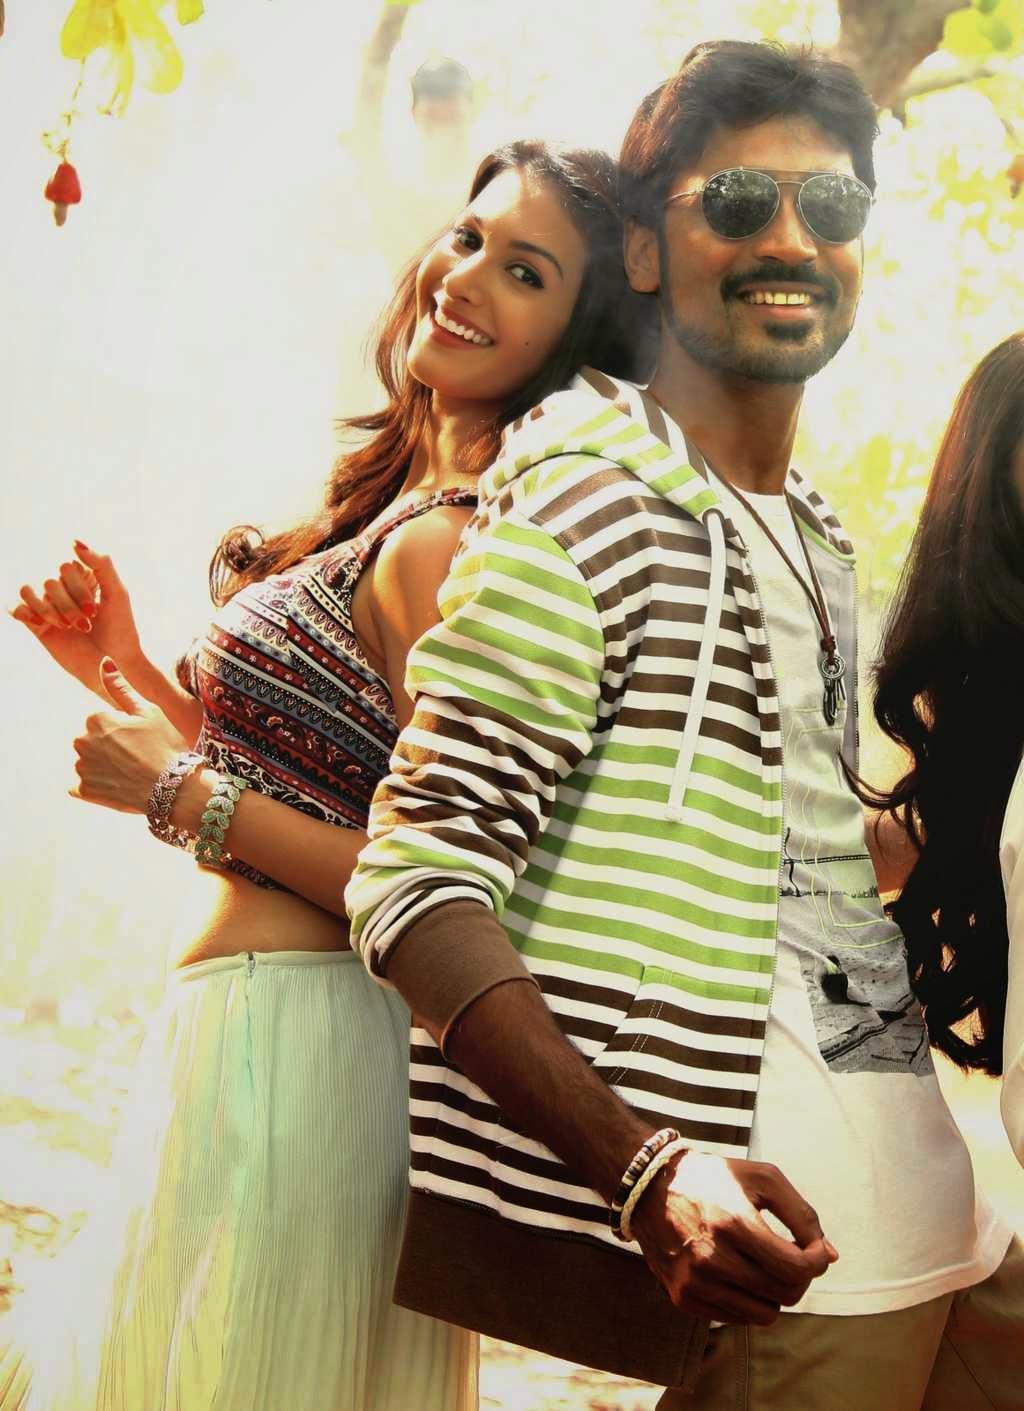 Dhanush-Anekudu Pics, Amyra Dastur, Dhanush Anekudu Movie Hot HD Stills